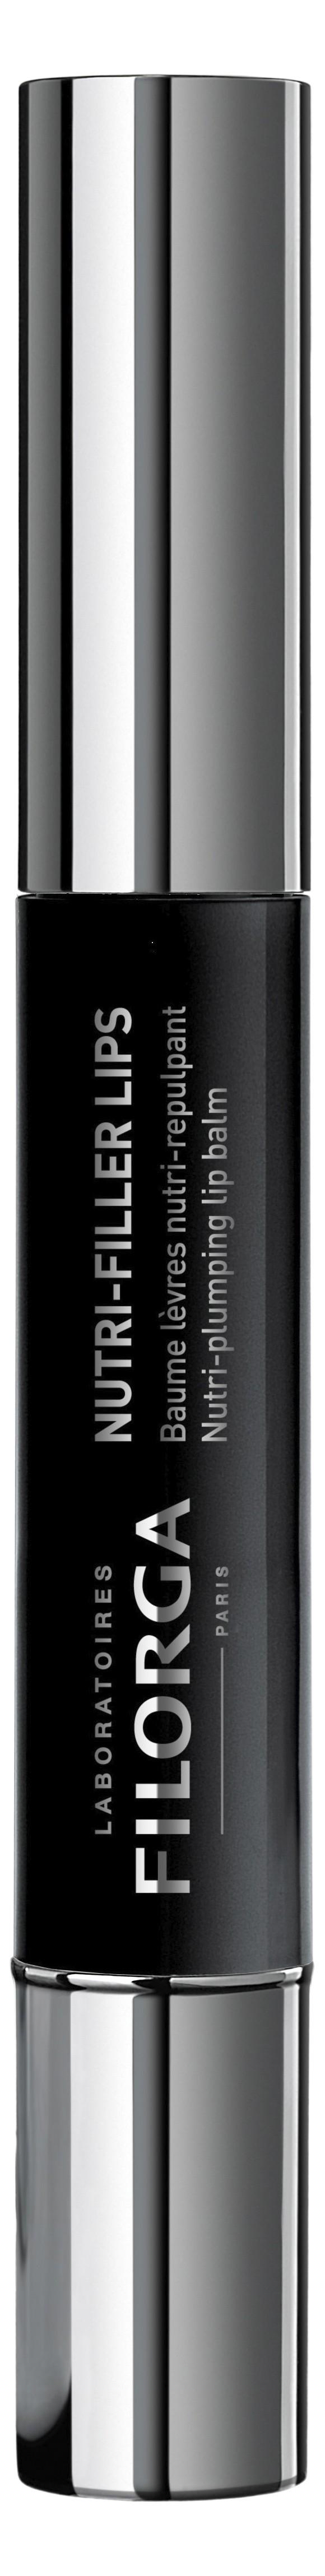 Filorga - Nutri-Filler Lips